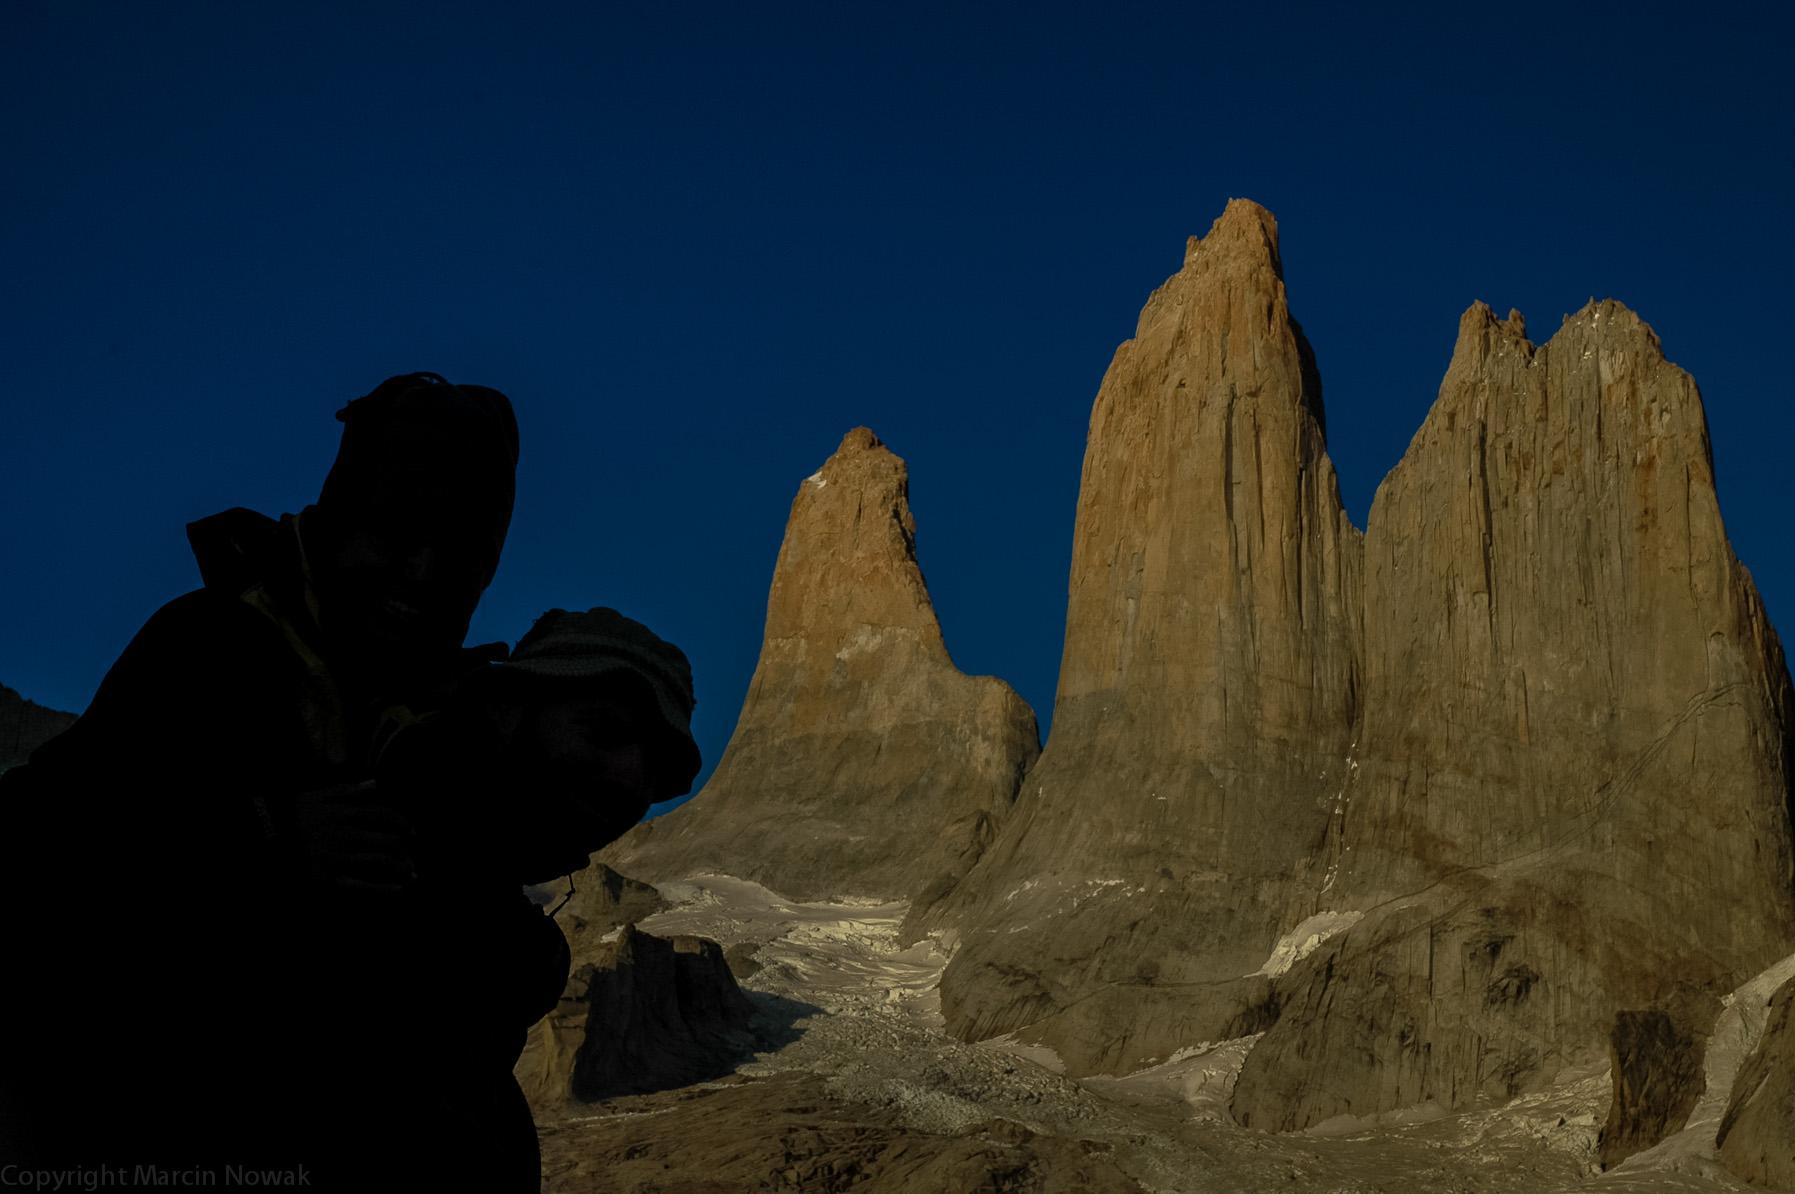 Torres del Paine i my